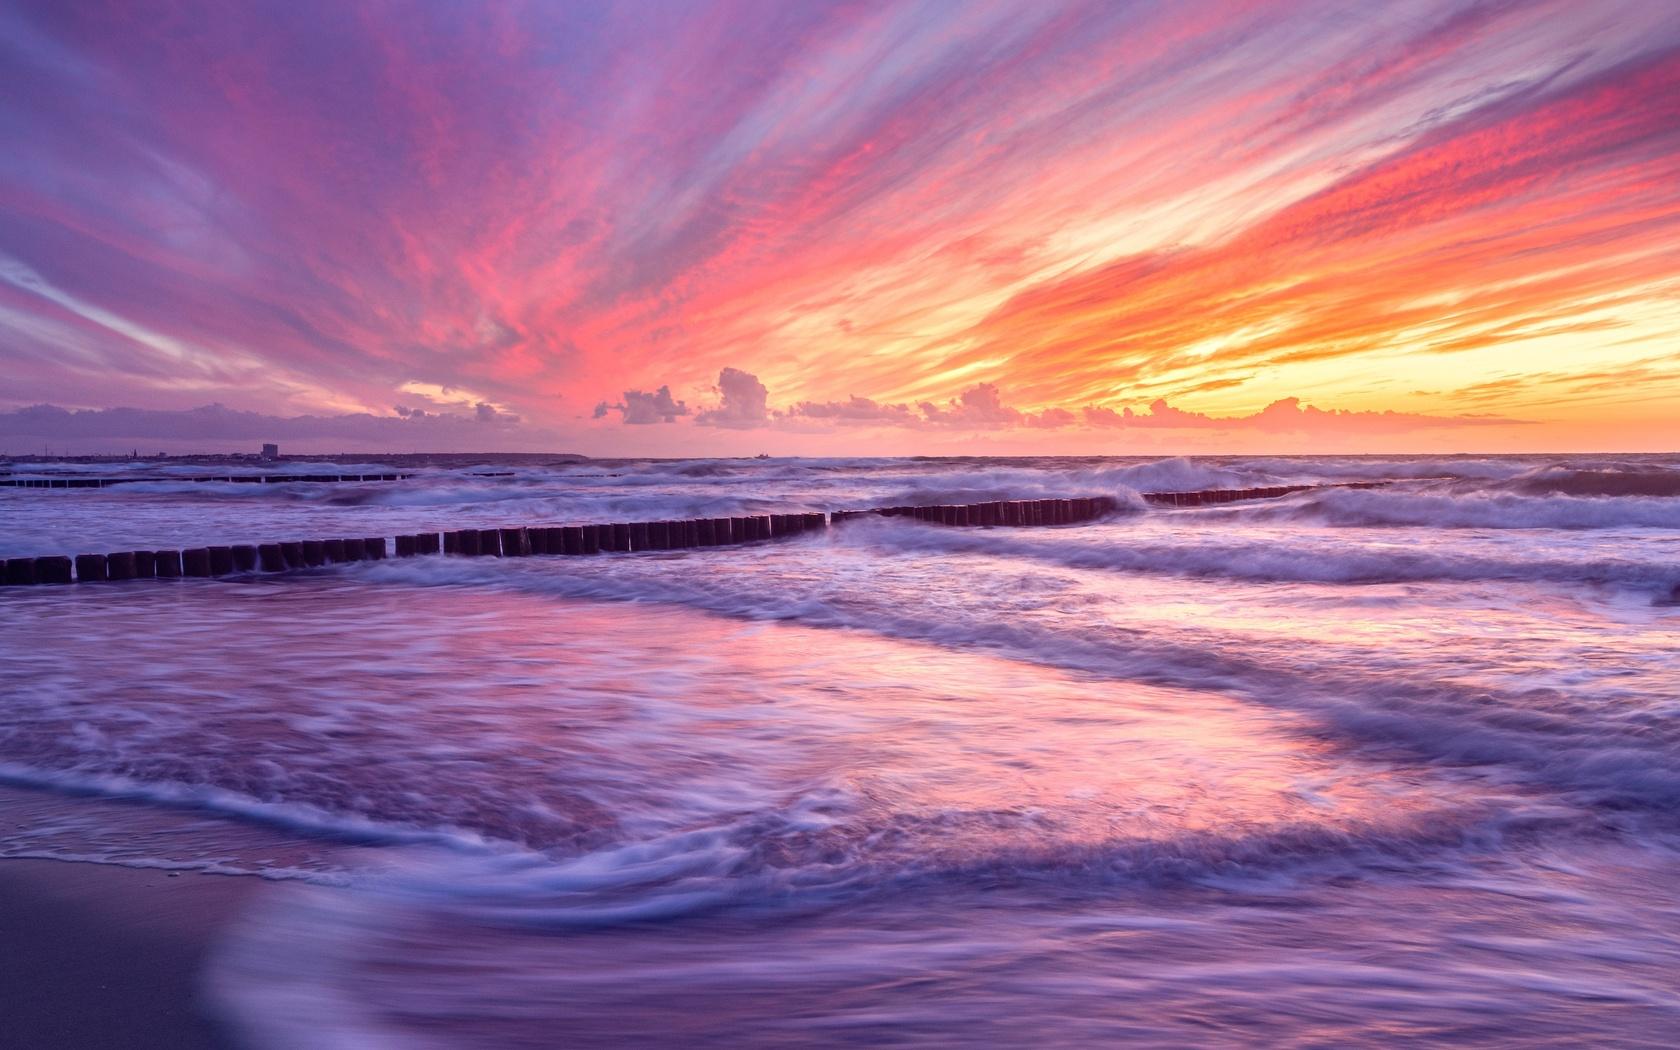 baltic-sea-sunset-1b.jpg